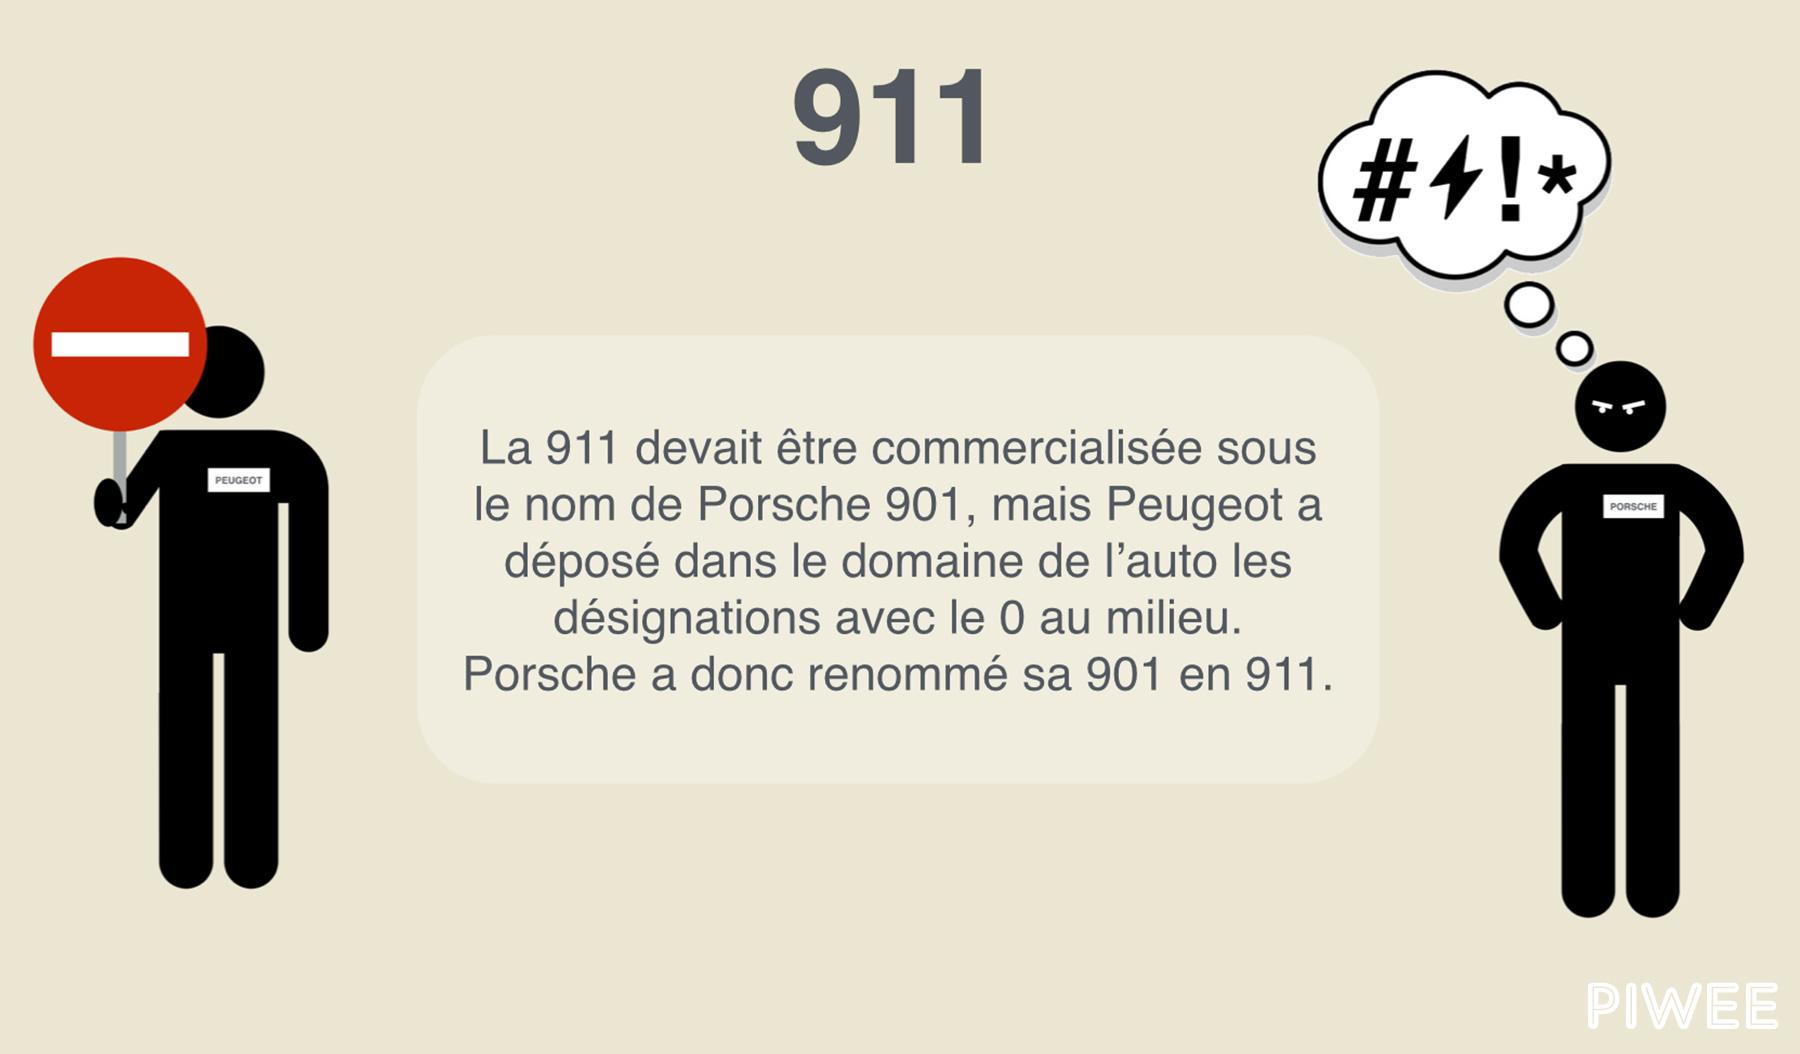 signification-chiffre-marque-porsche-911